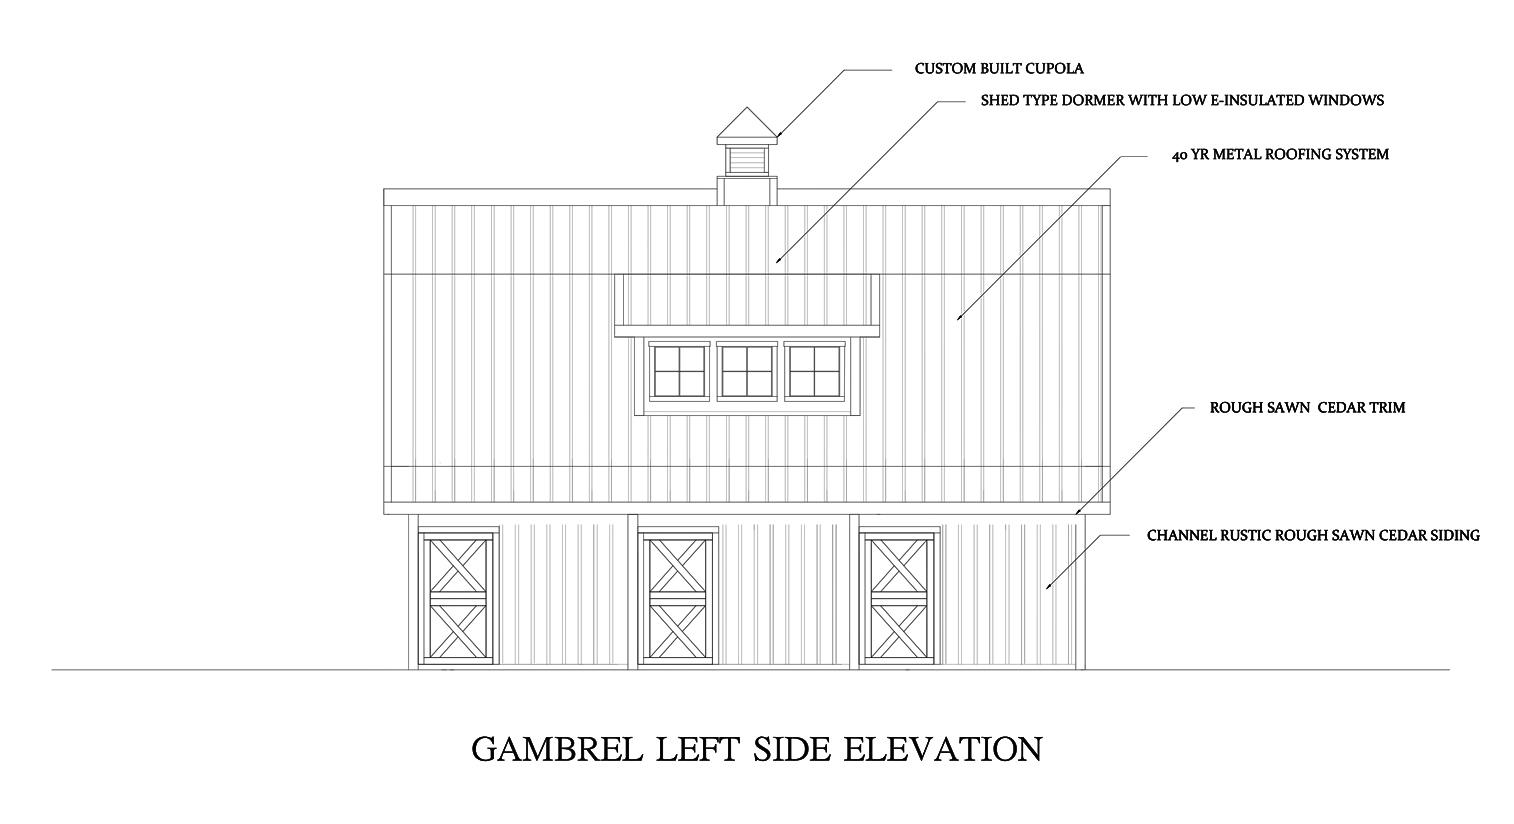 Dutch Barn Door Plans Barns And Buildings Quality Barns And Buildings Horse Barns